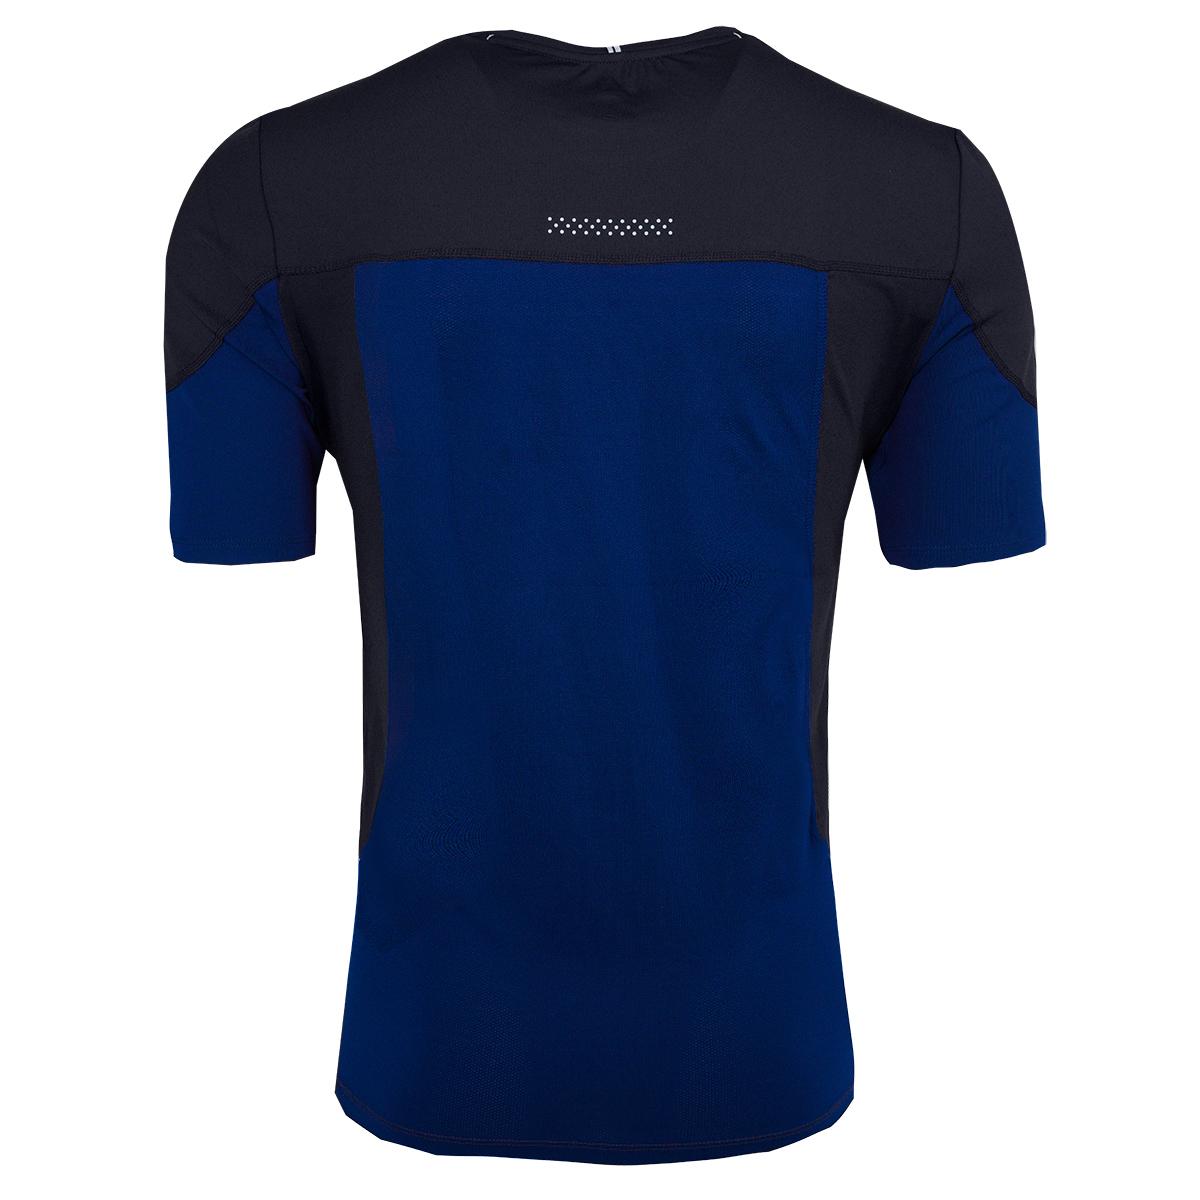 Body-Glove-Men-039-s-Signature-Color-Block-T-Shirt thumbnail 5